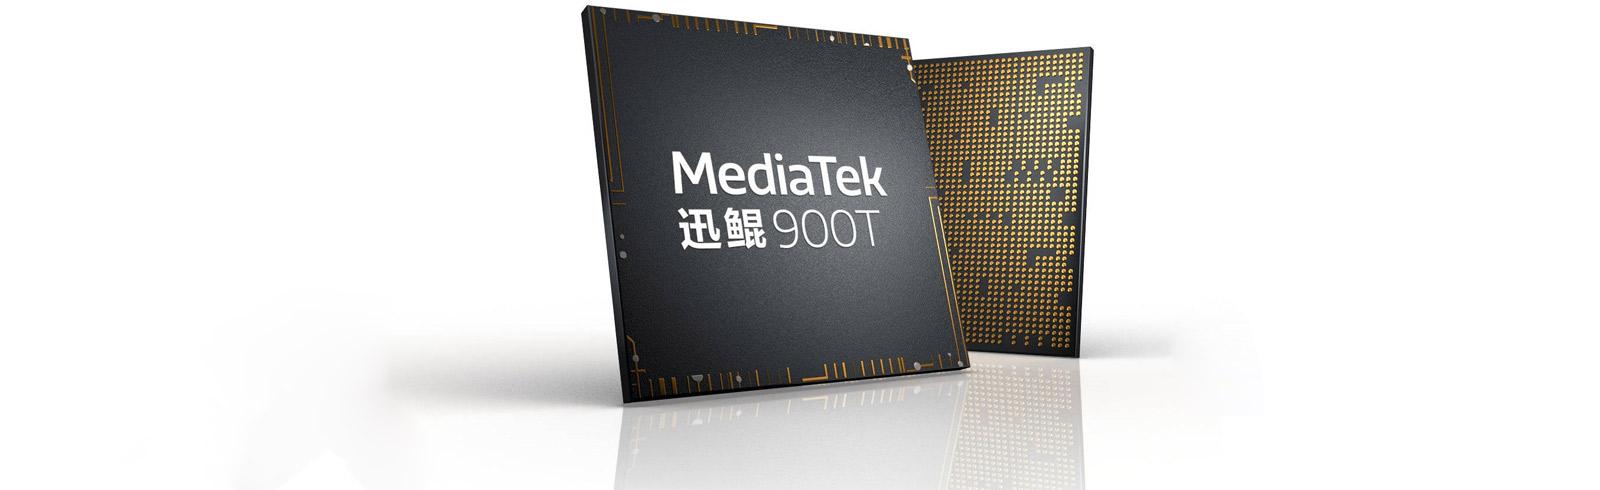 MediaTek unveils the Kompanio 900T chipset for mid-range tablets